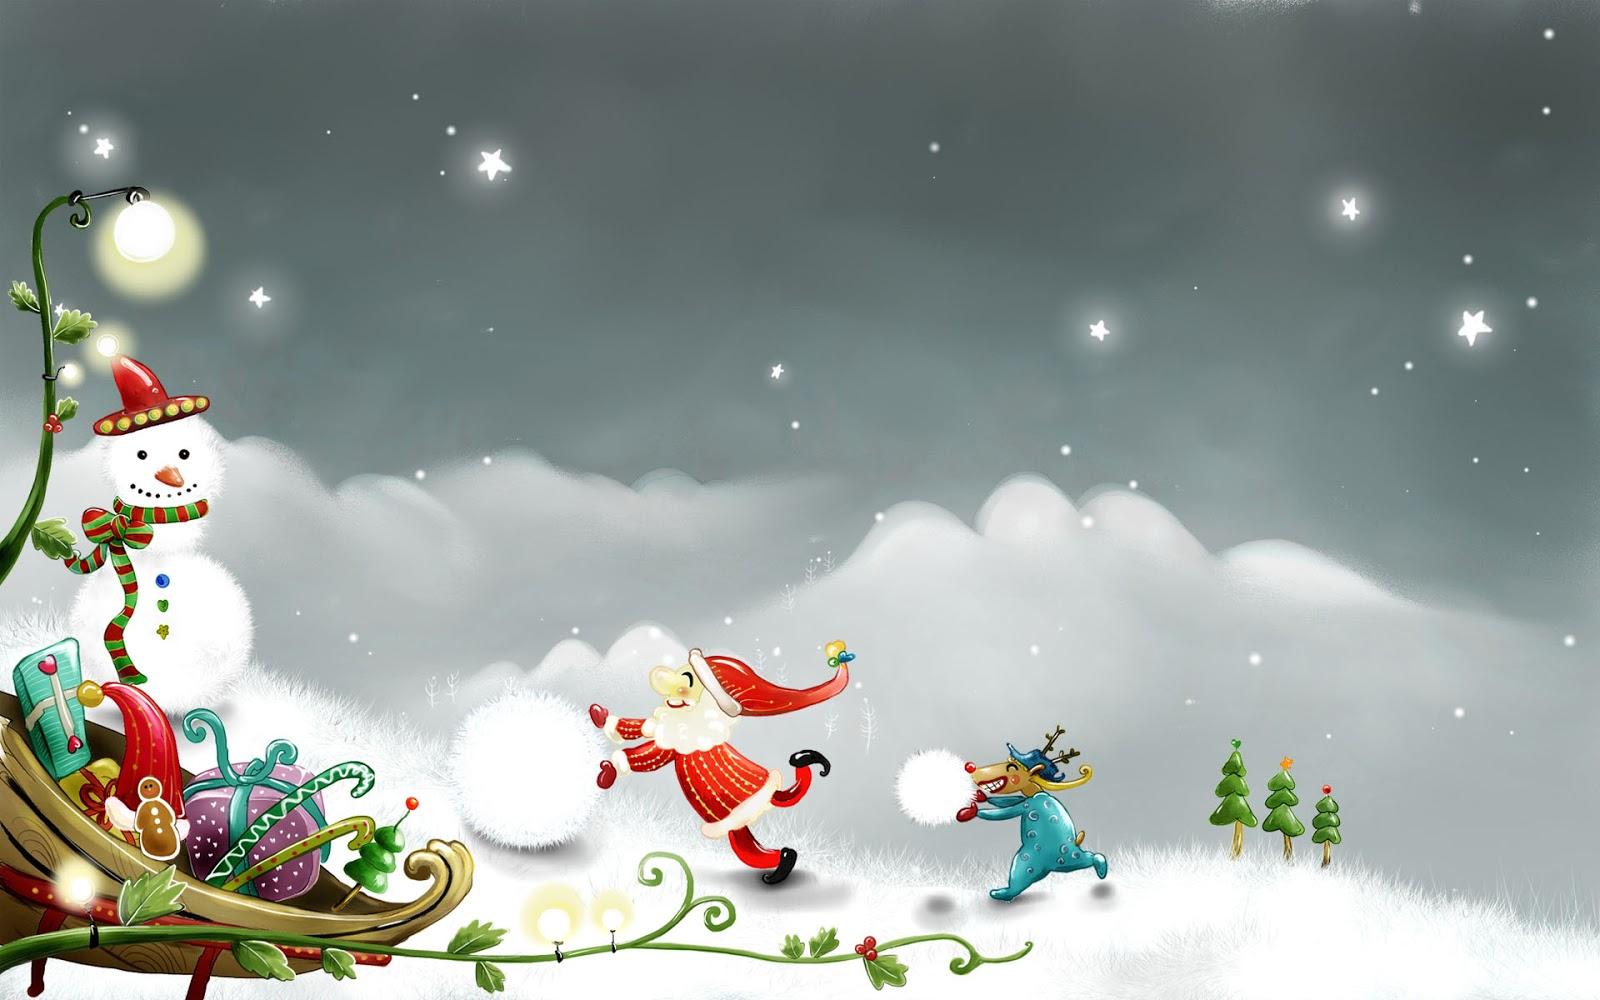 16 Stunning <b>High</b> Resolution <b>Christmas Wallpapers</b> | Crestock.com Blog